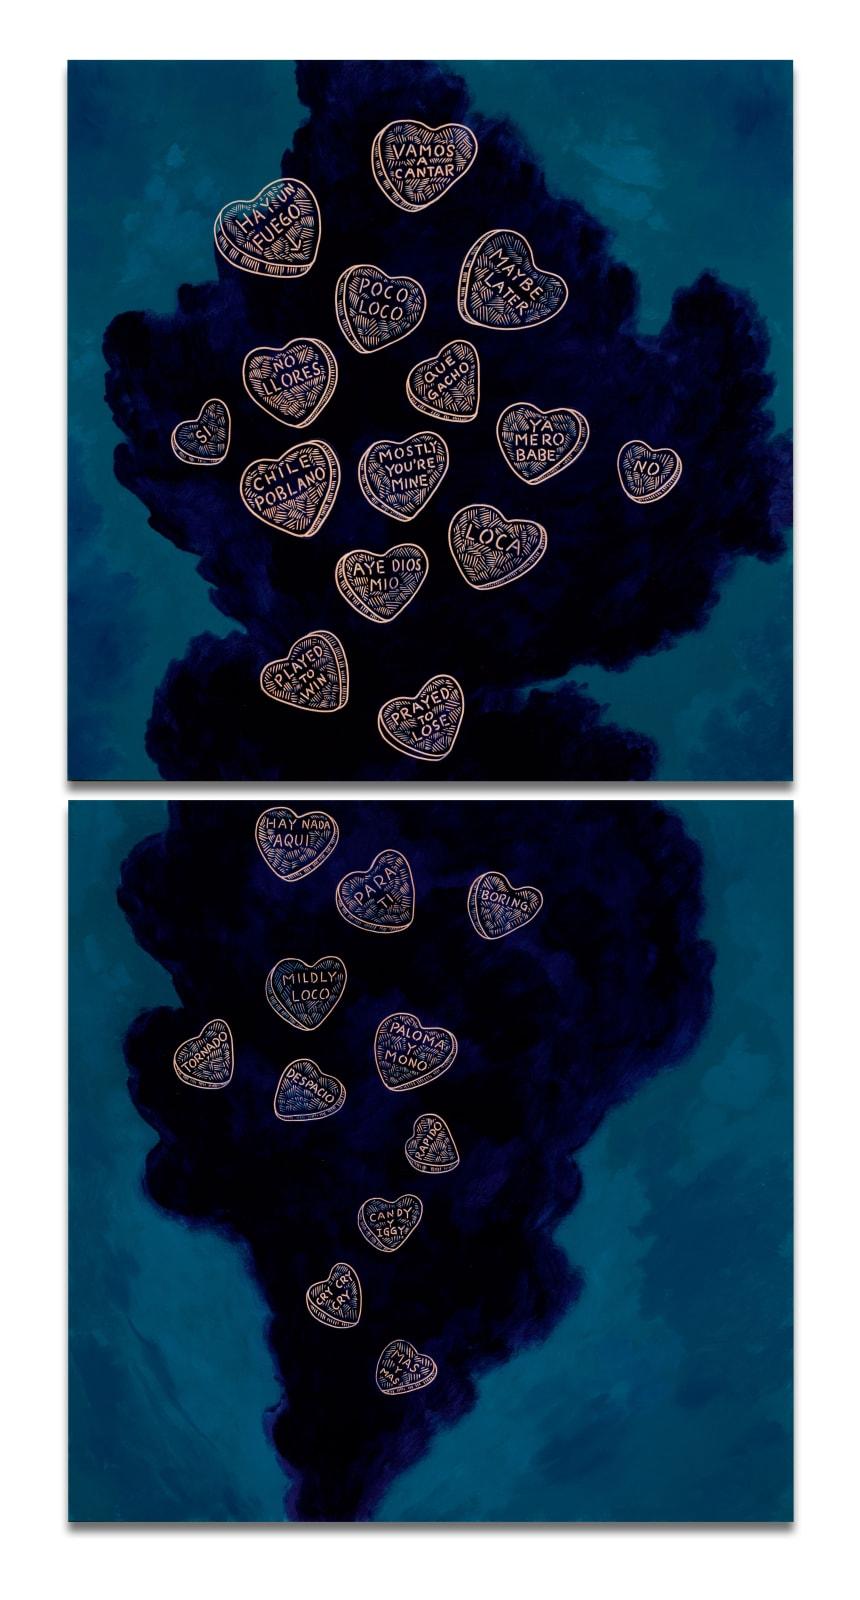 Ricky Armendariz, Candy Hearts, 2015